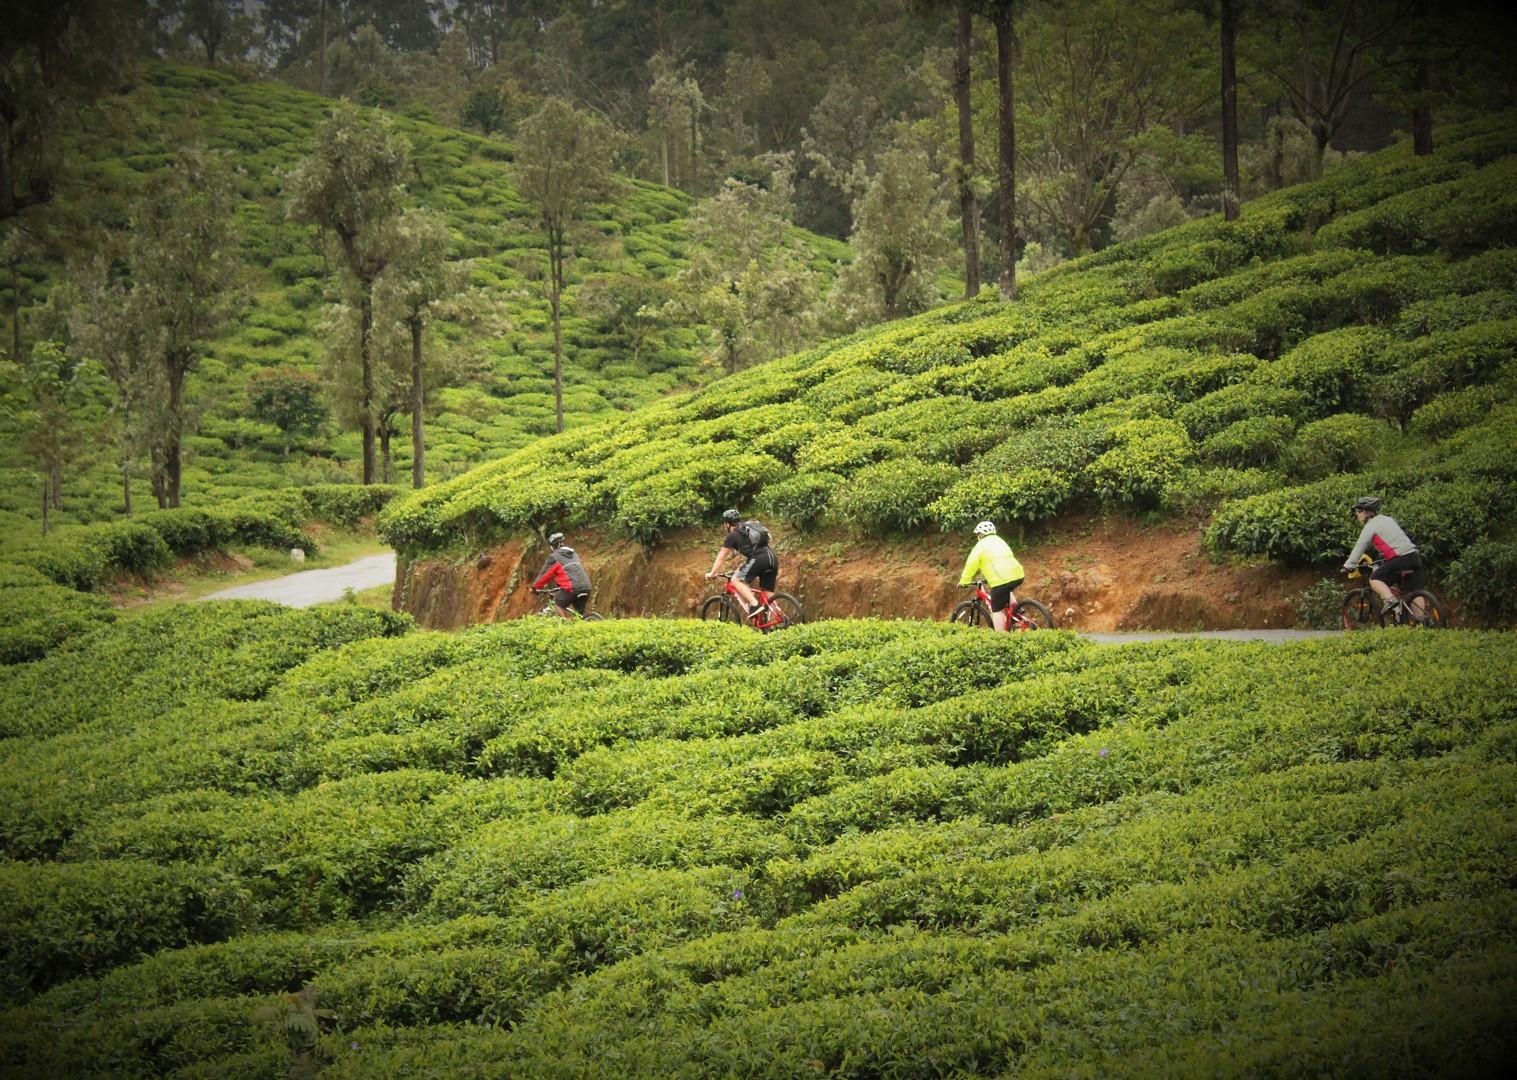 guided-cycling-holiday-in-sri-lanka-tea-plantations.jpg - Sri Lanka - Backroads and Beaches - Cycling Adventures